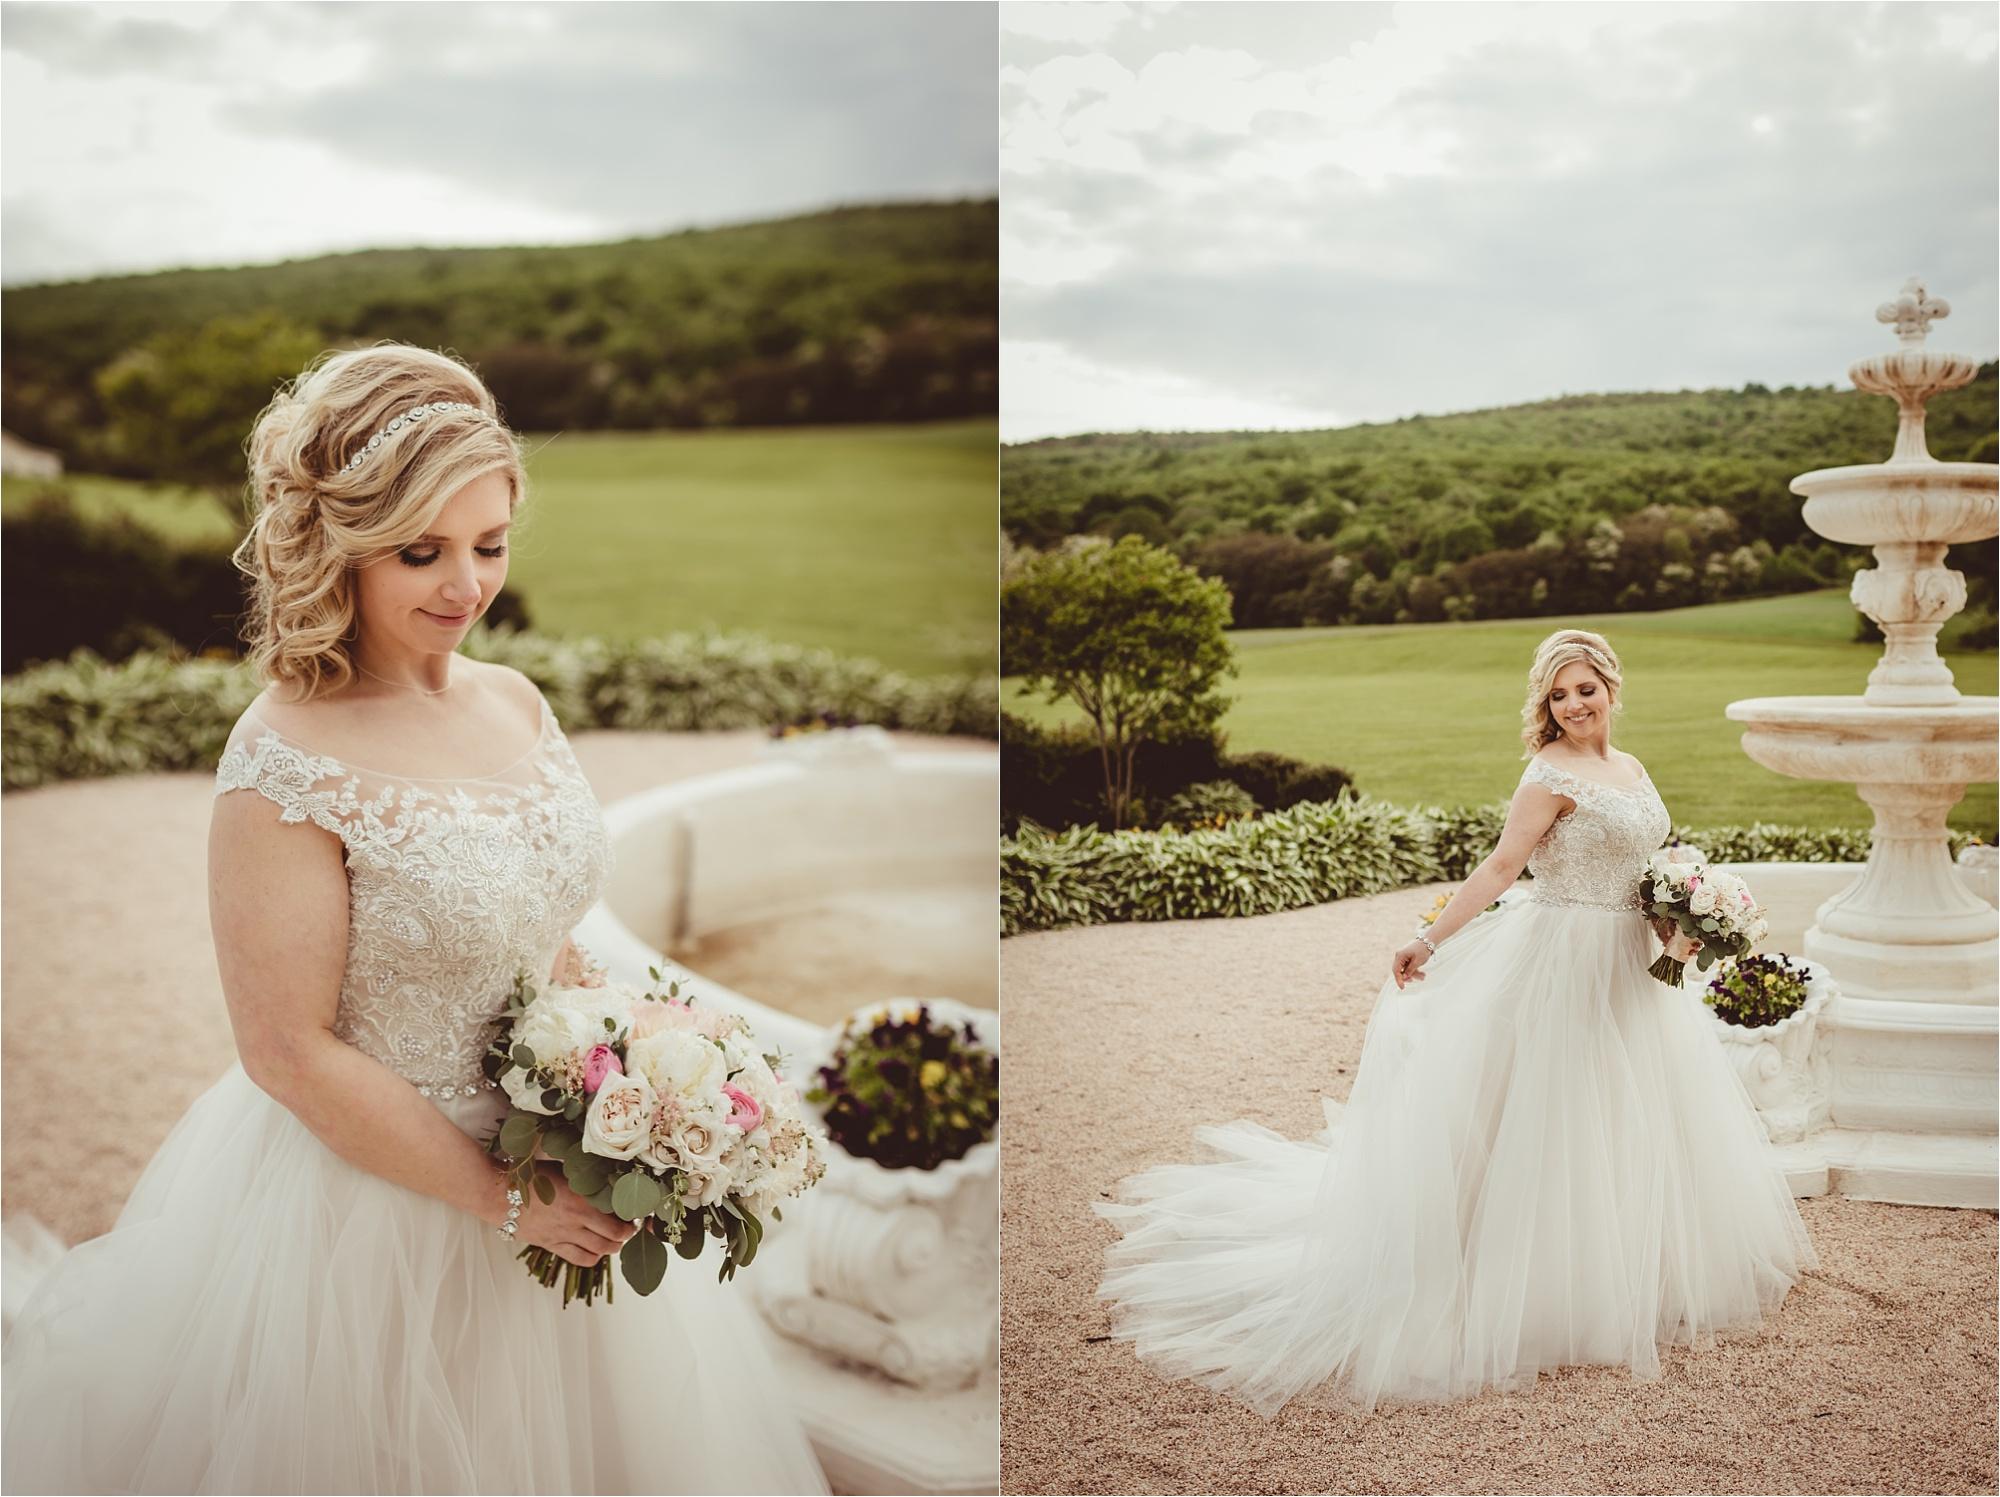 brittney-nestle-photo-gary-and-annelise-springfield-manor-wedding.jpg